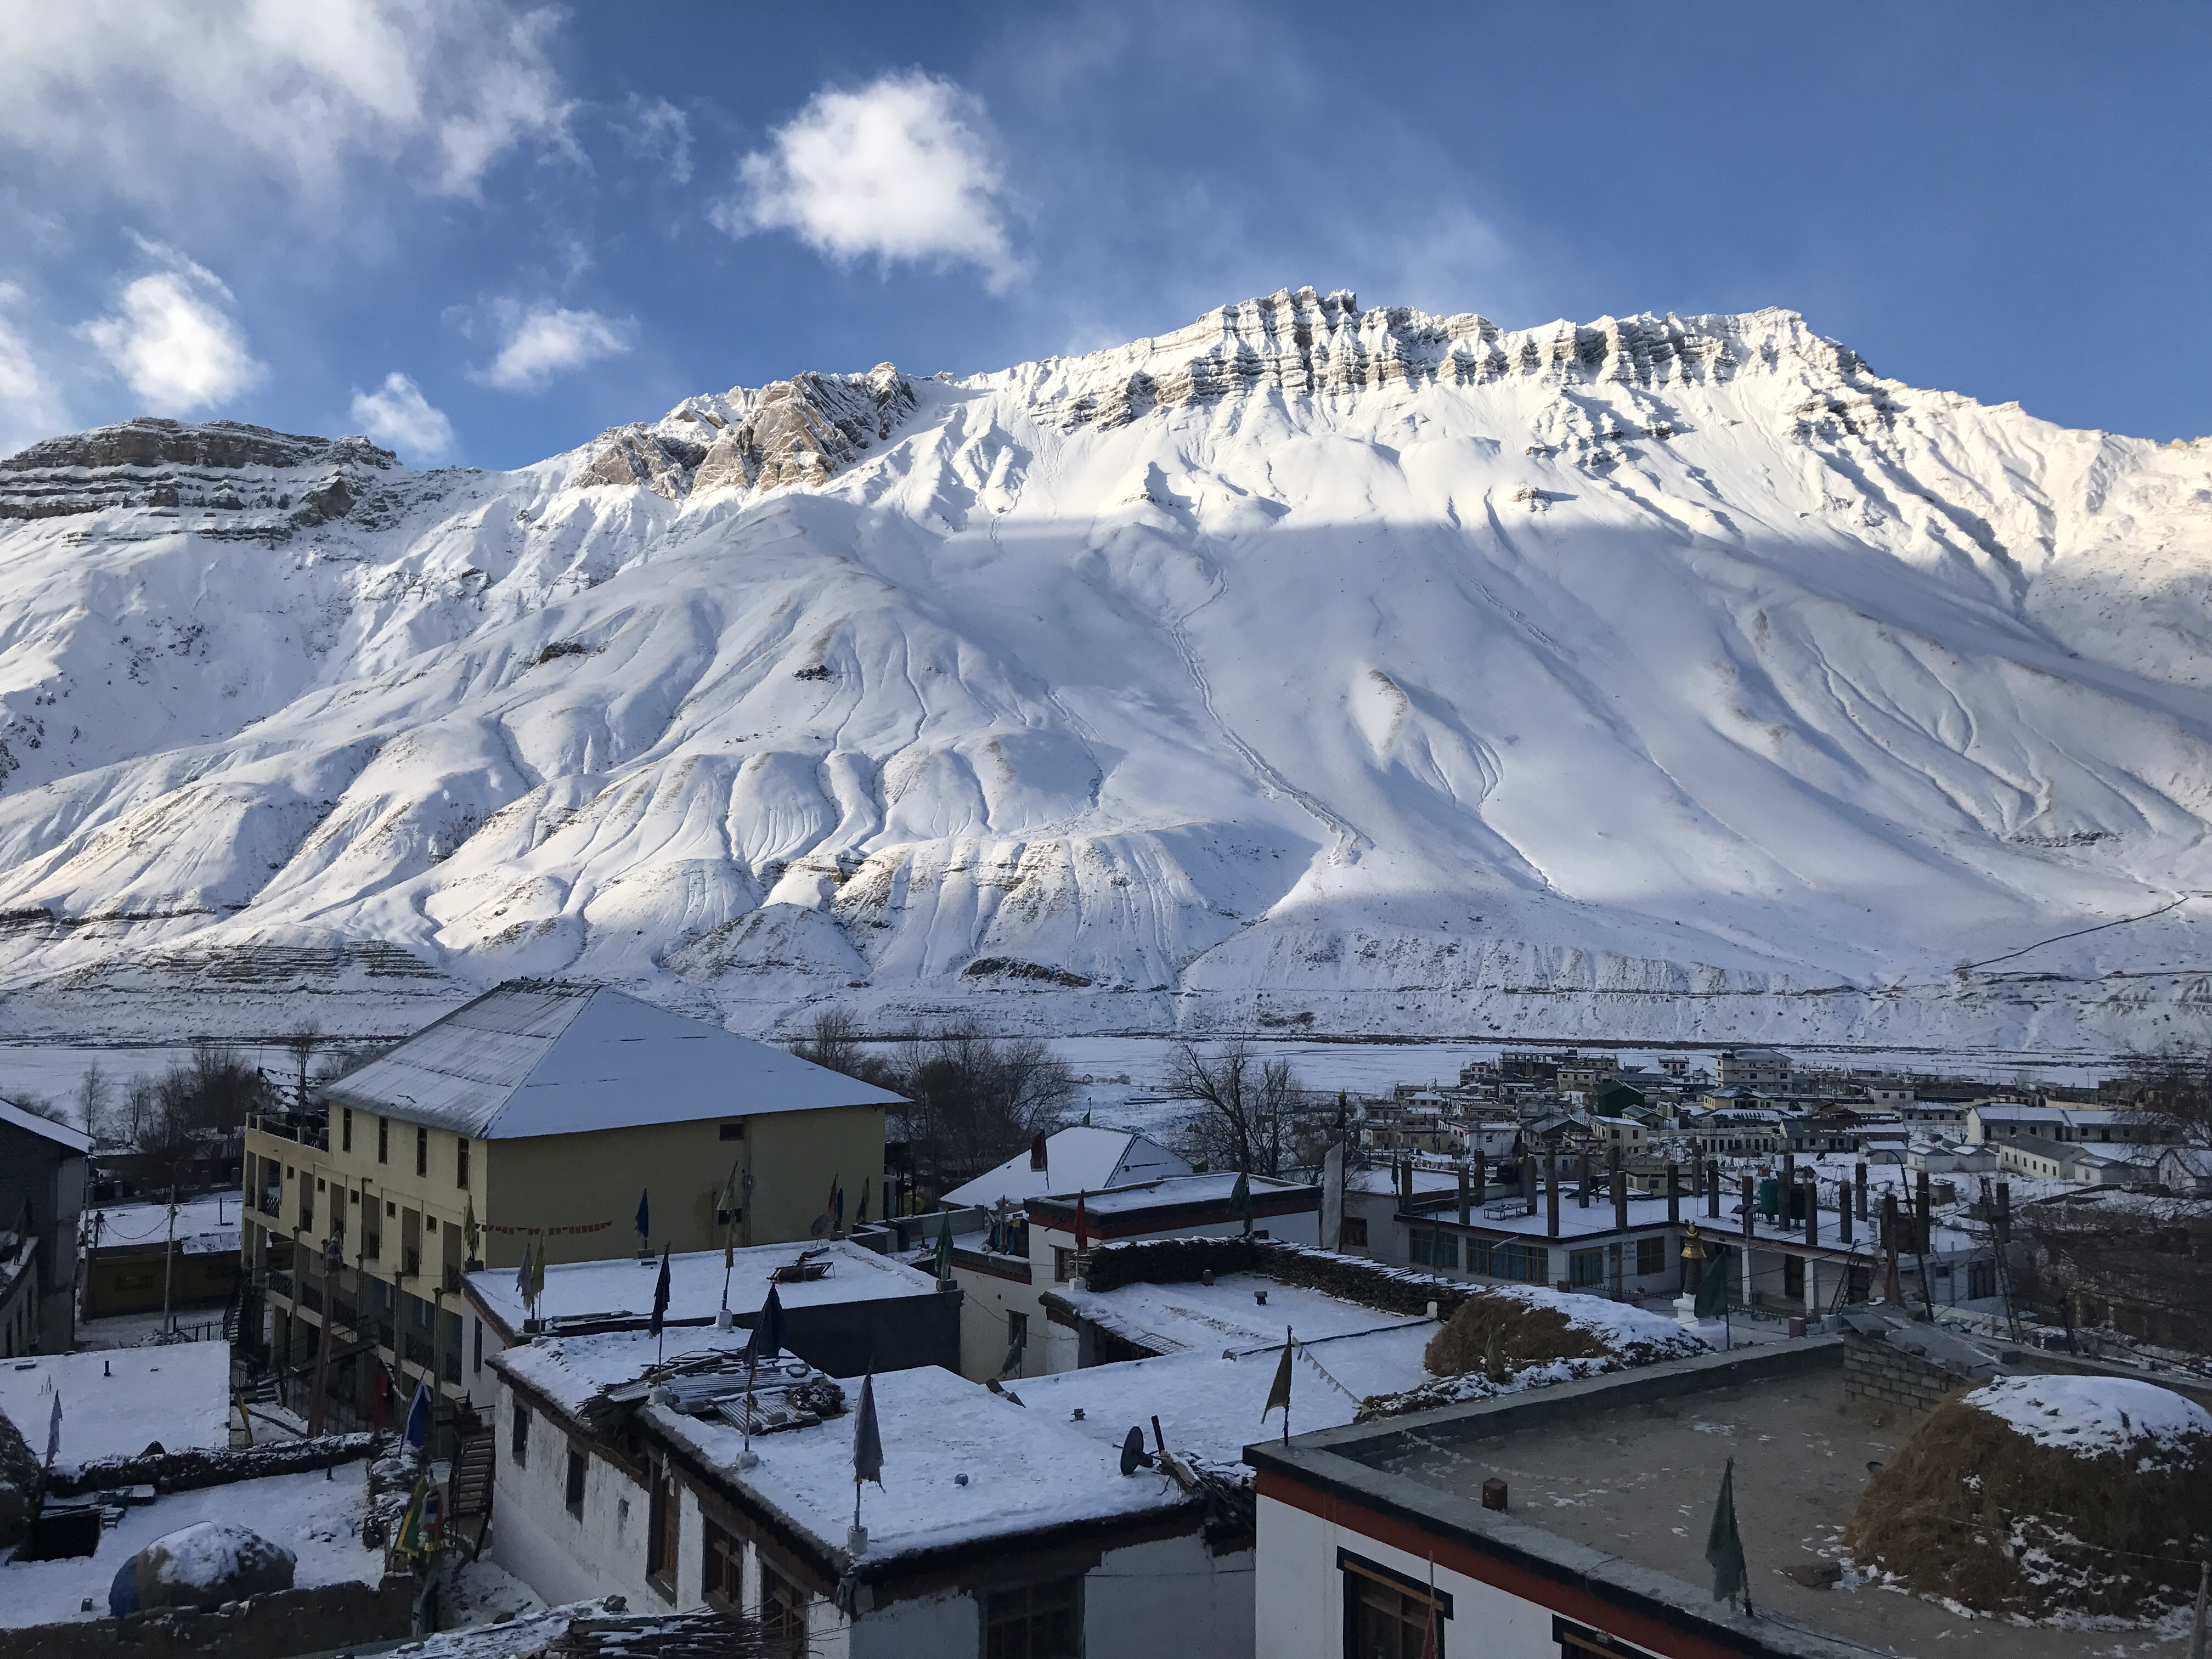 Morning View of town, Kaza Lahaul and Spiti, Himachal Pradesh, India.